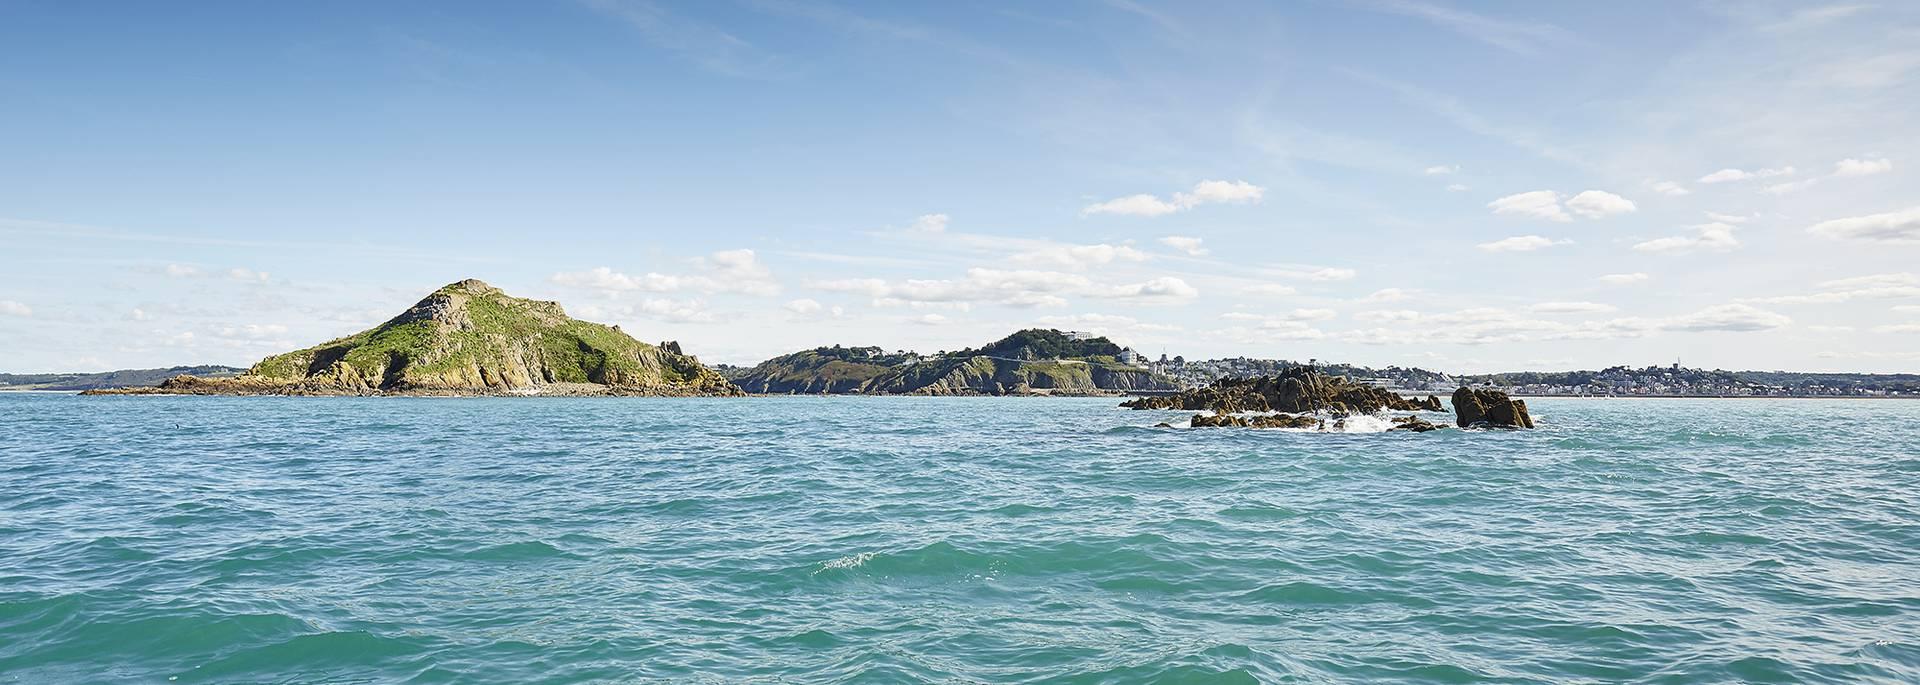 L'îlot du Verdelet